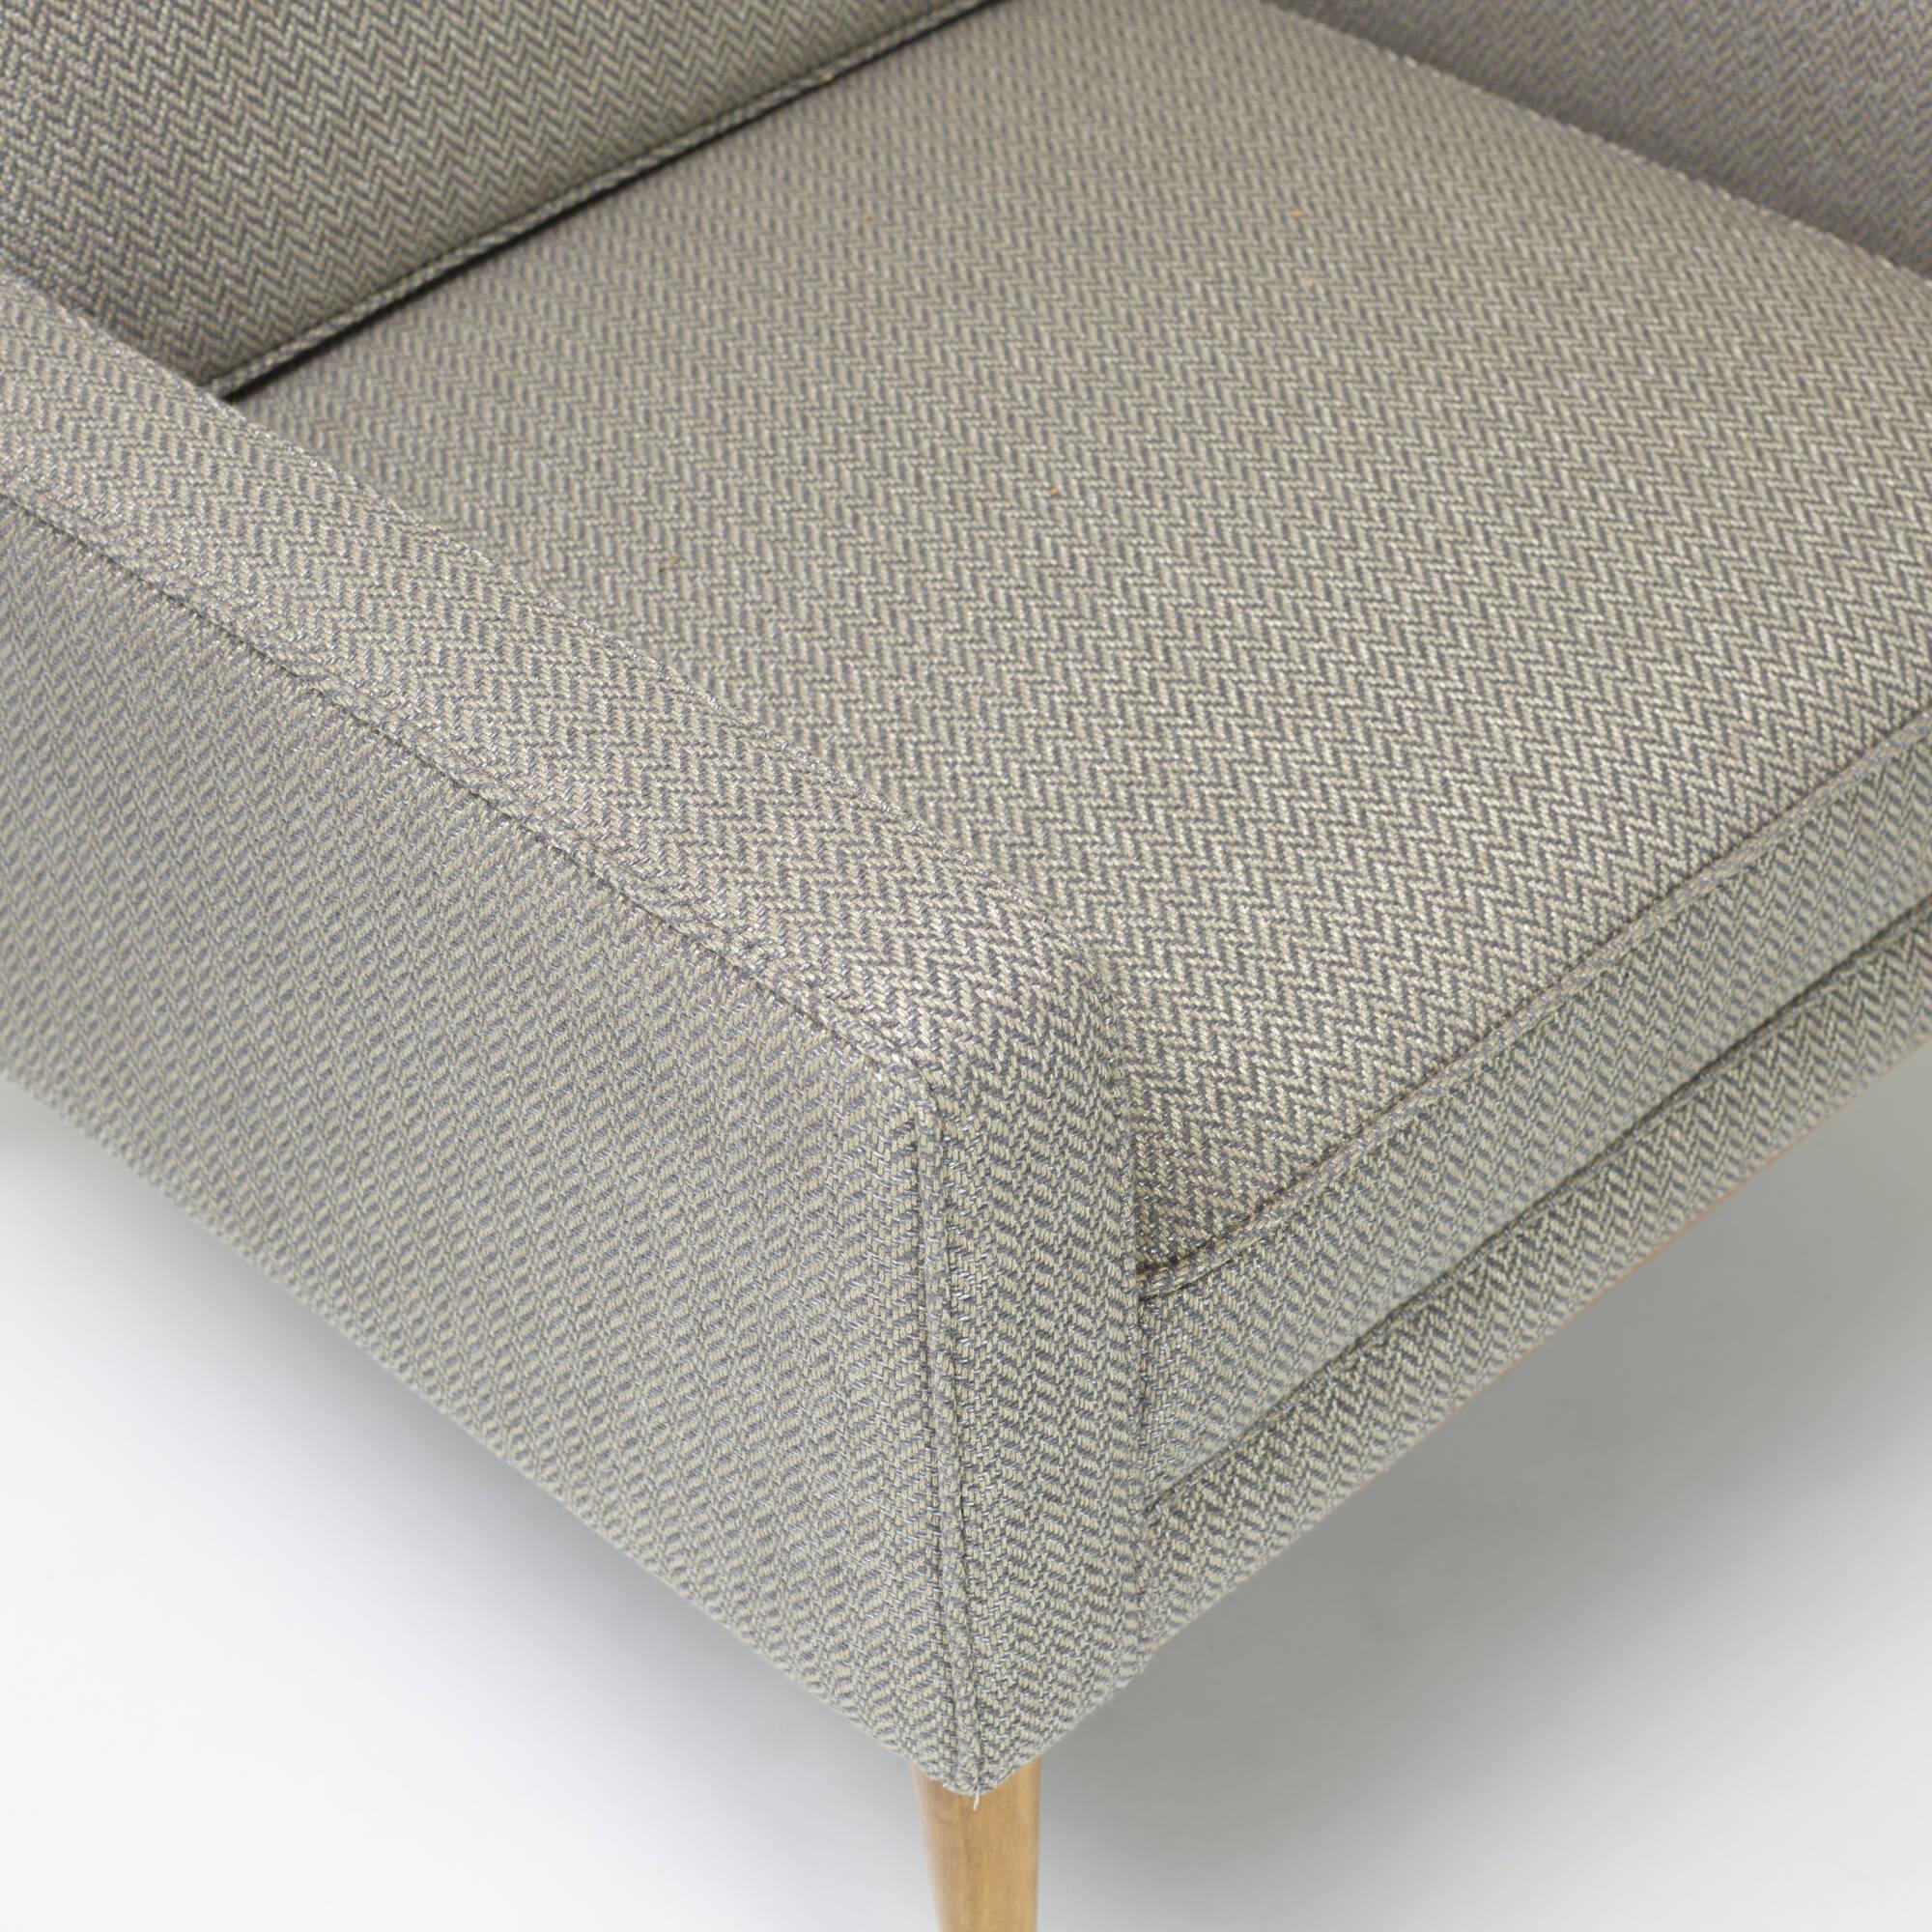 348: Paul McCobb / lounge chairs model 302, pair (3 of 3)